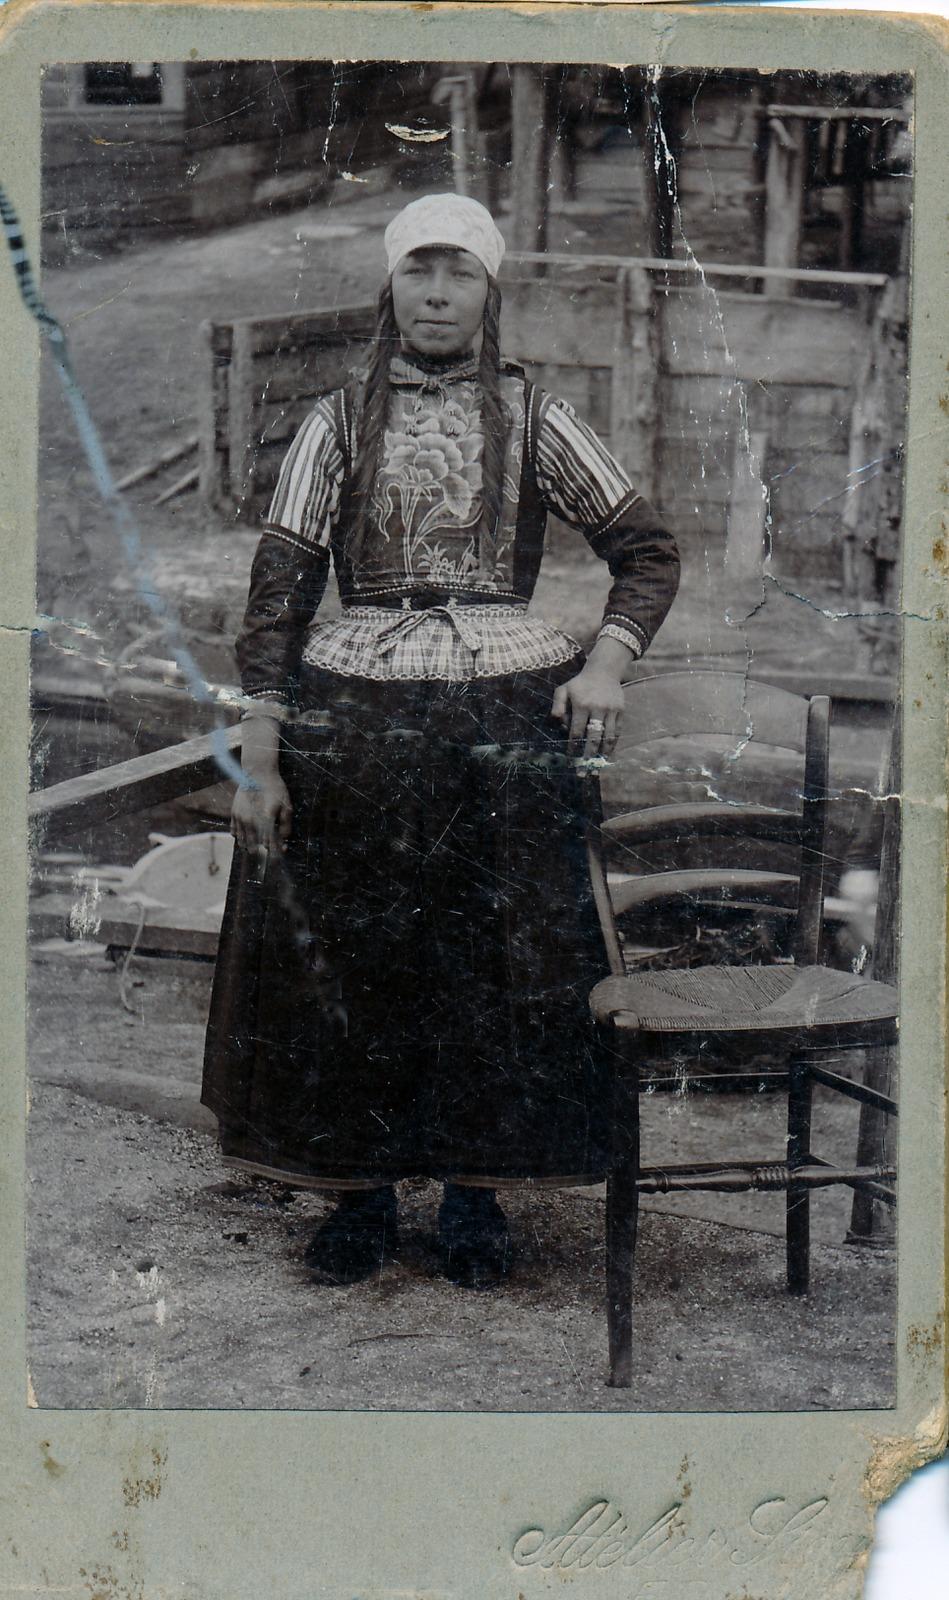 Vrouw in Marker klederdracht.